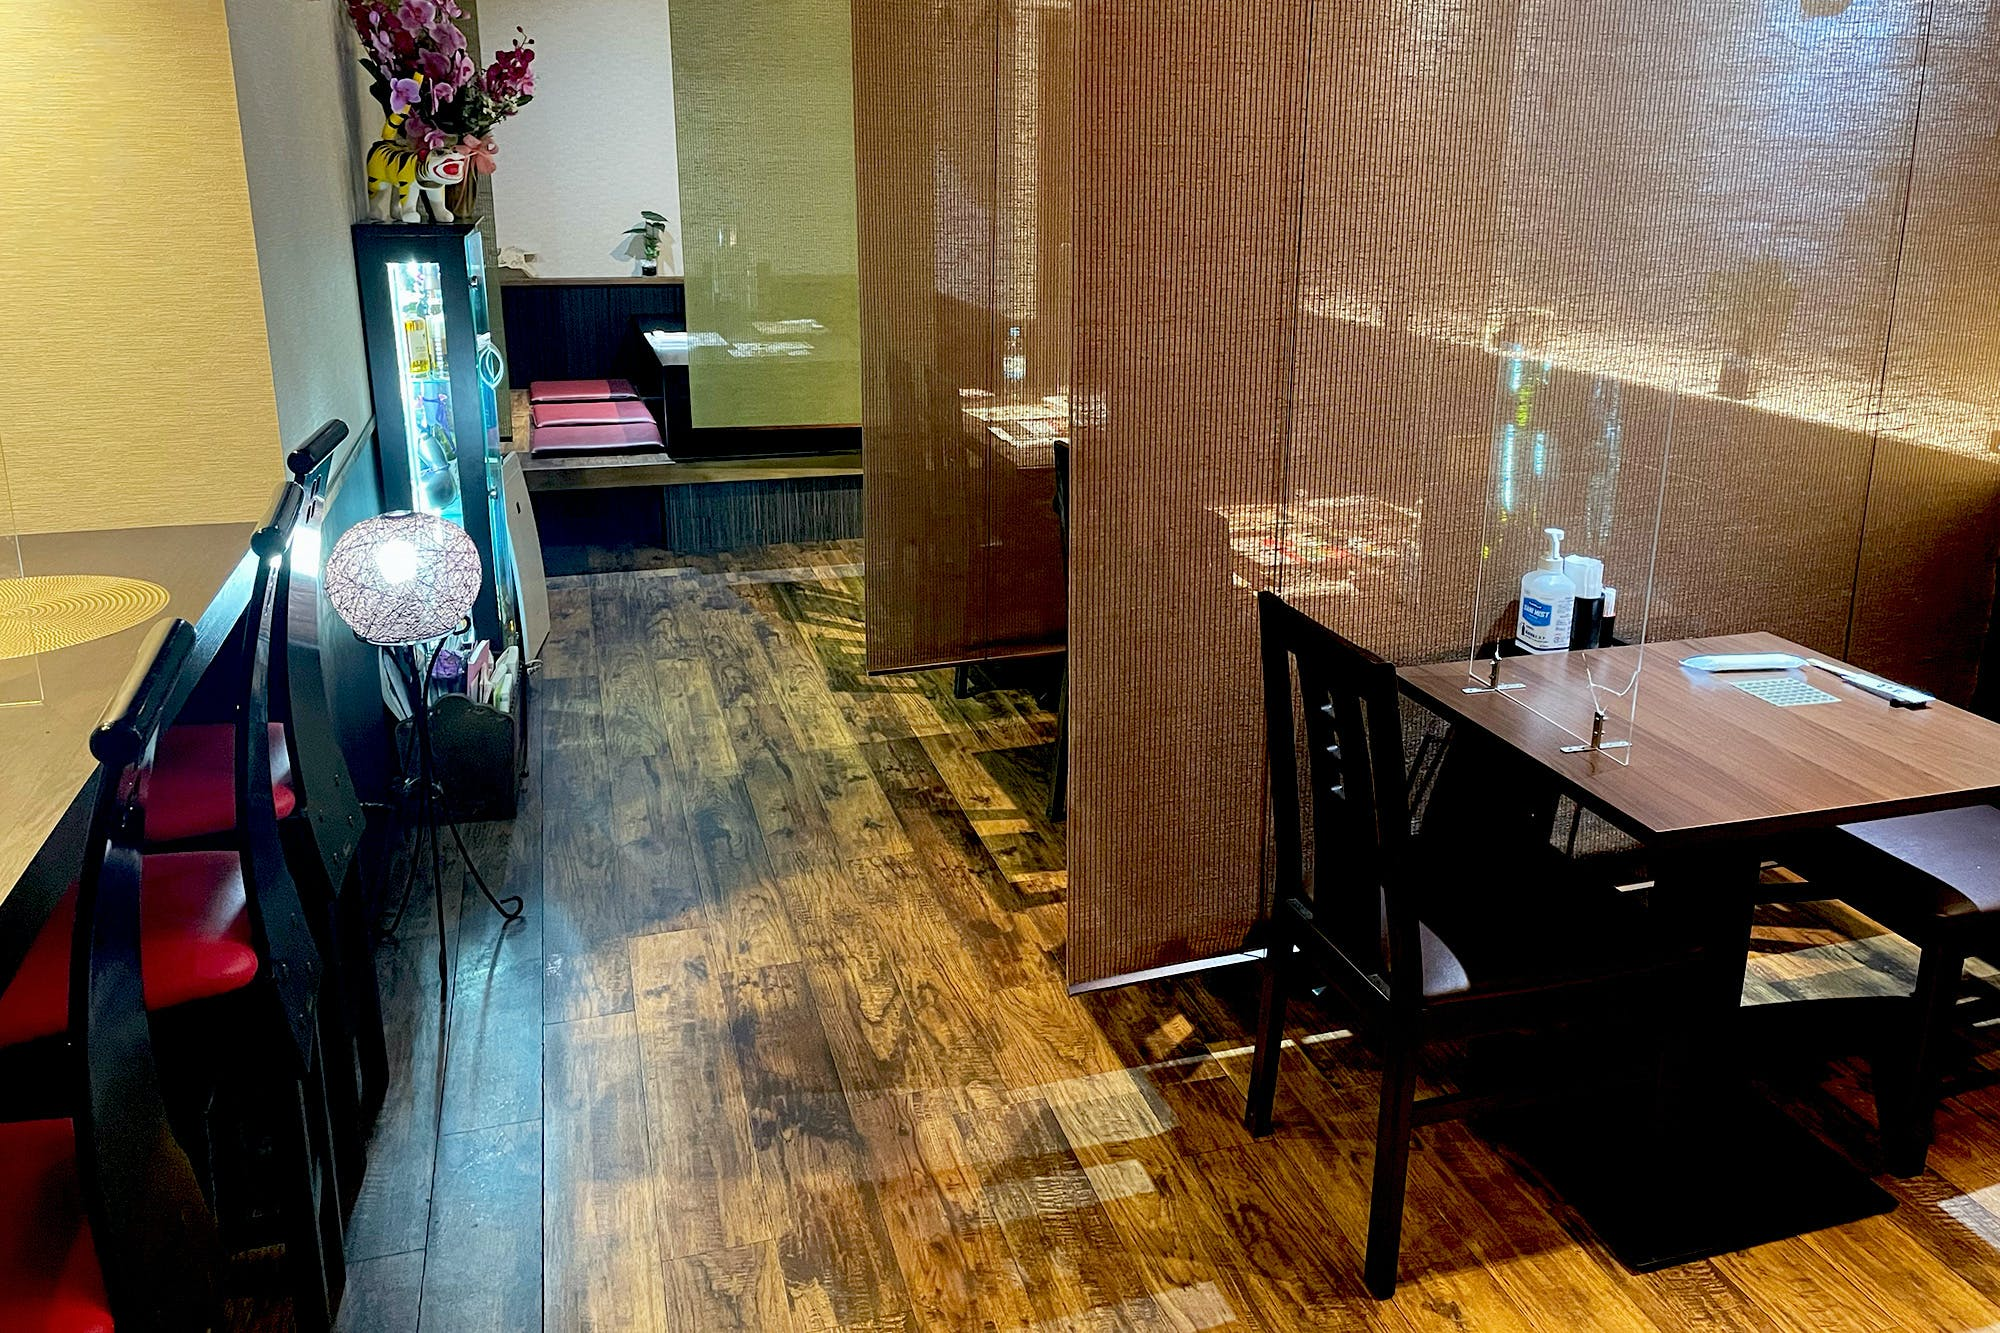 c6b98dab4191c 北浜 本町のその他 - gooグルメ&料理